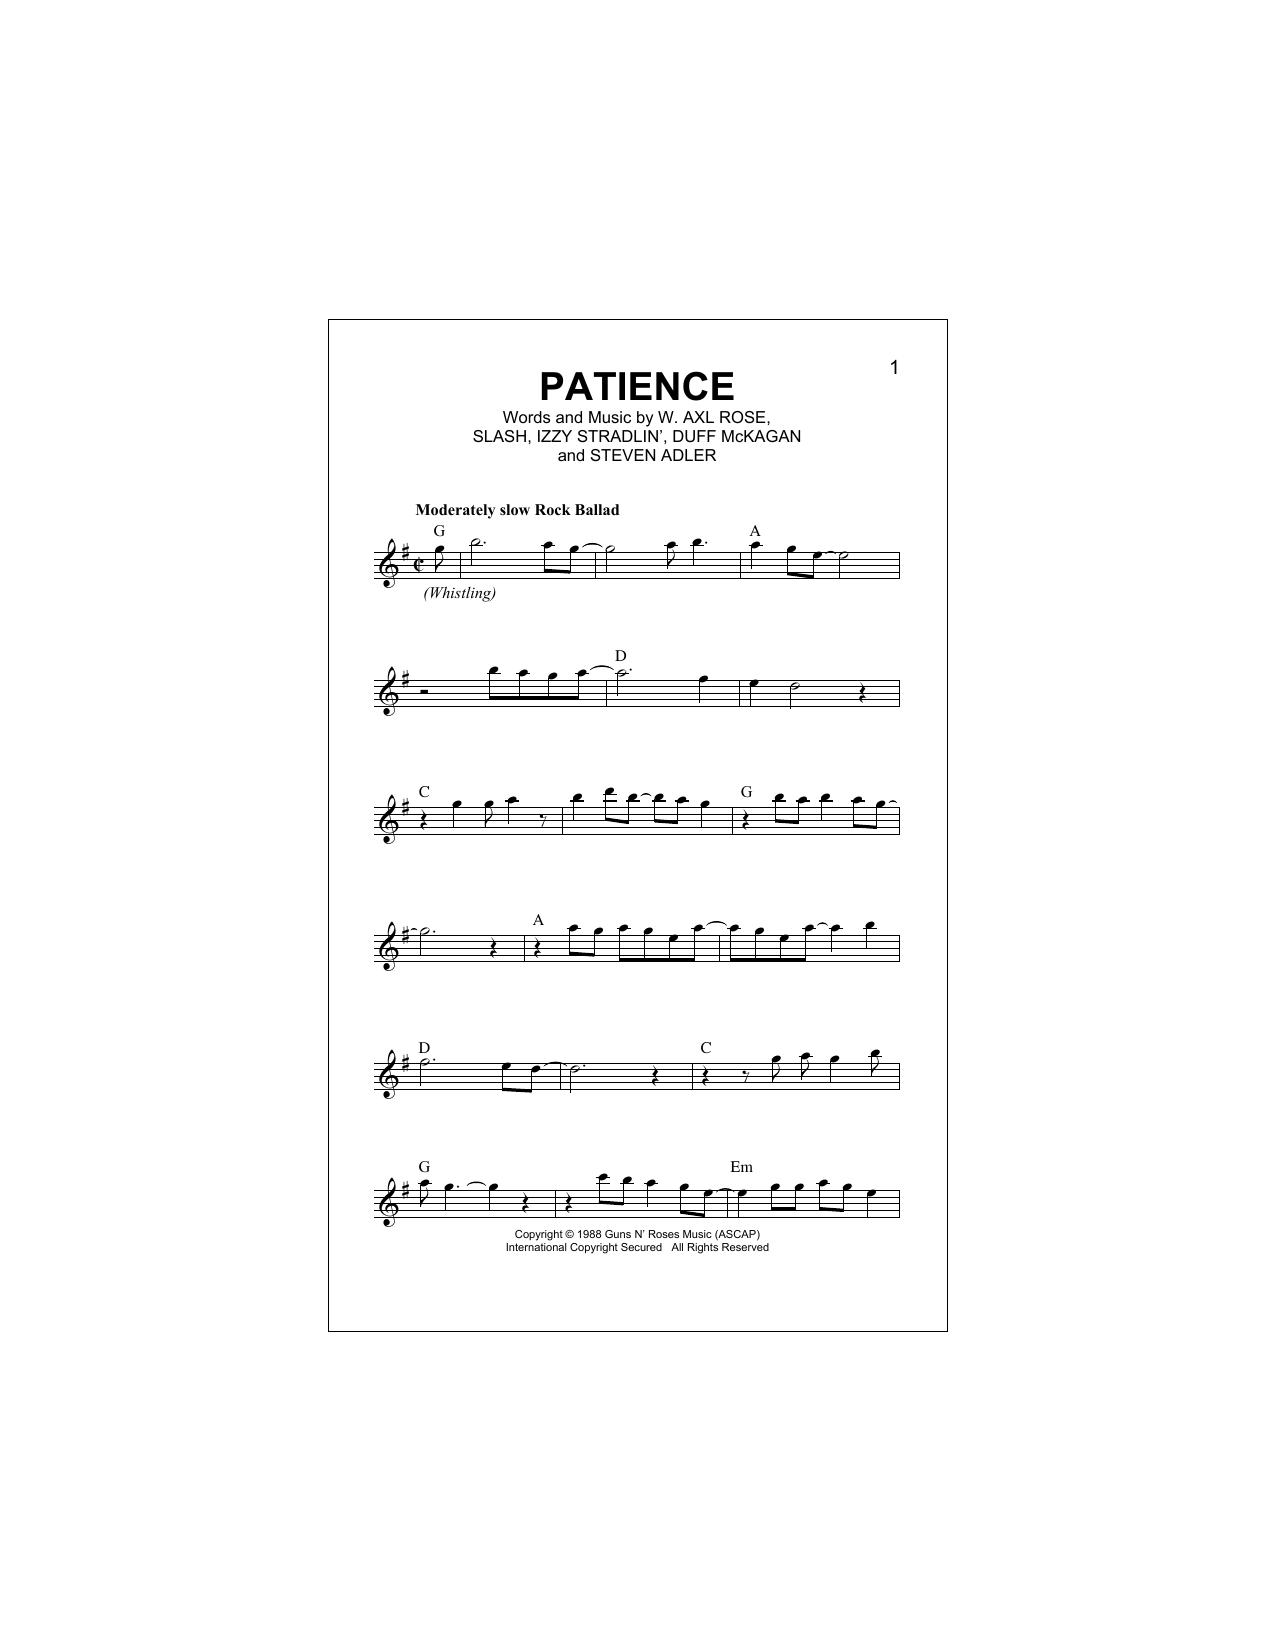 Sheet music digital files to print licensed izzy stradlin file types hexwebz Gallery